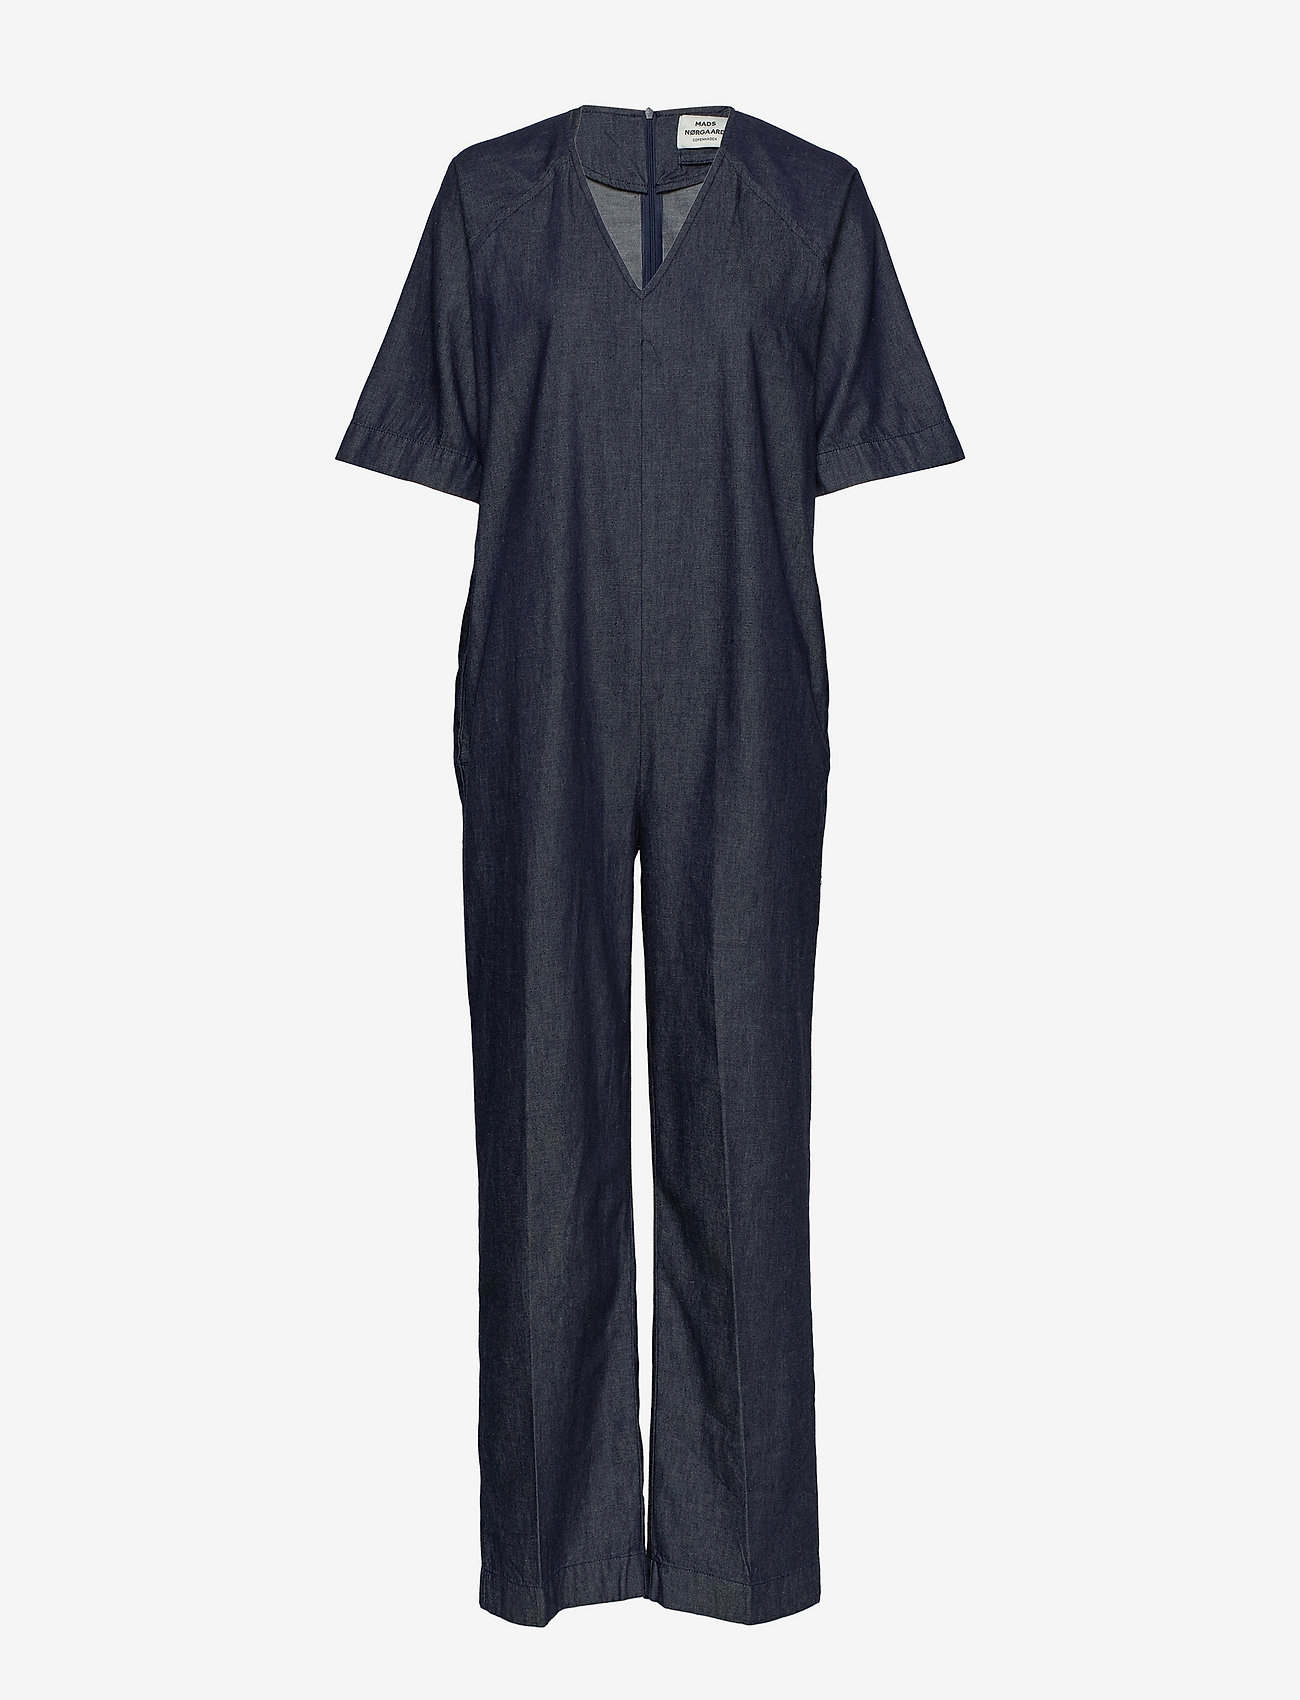 Mads Nørgaard - Fall Indigo Jilda - clothing - unwashed - 2